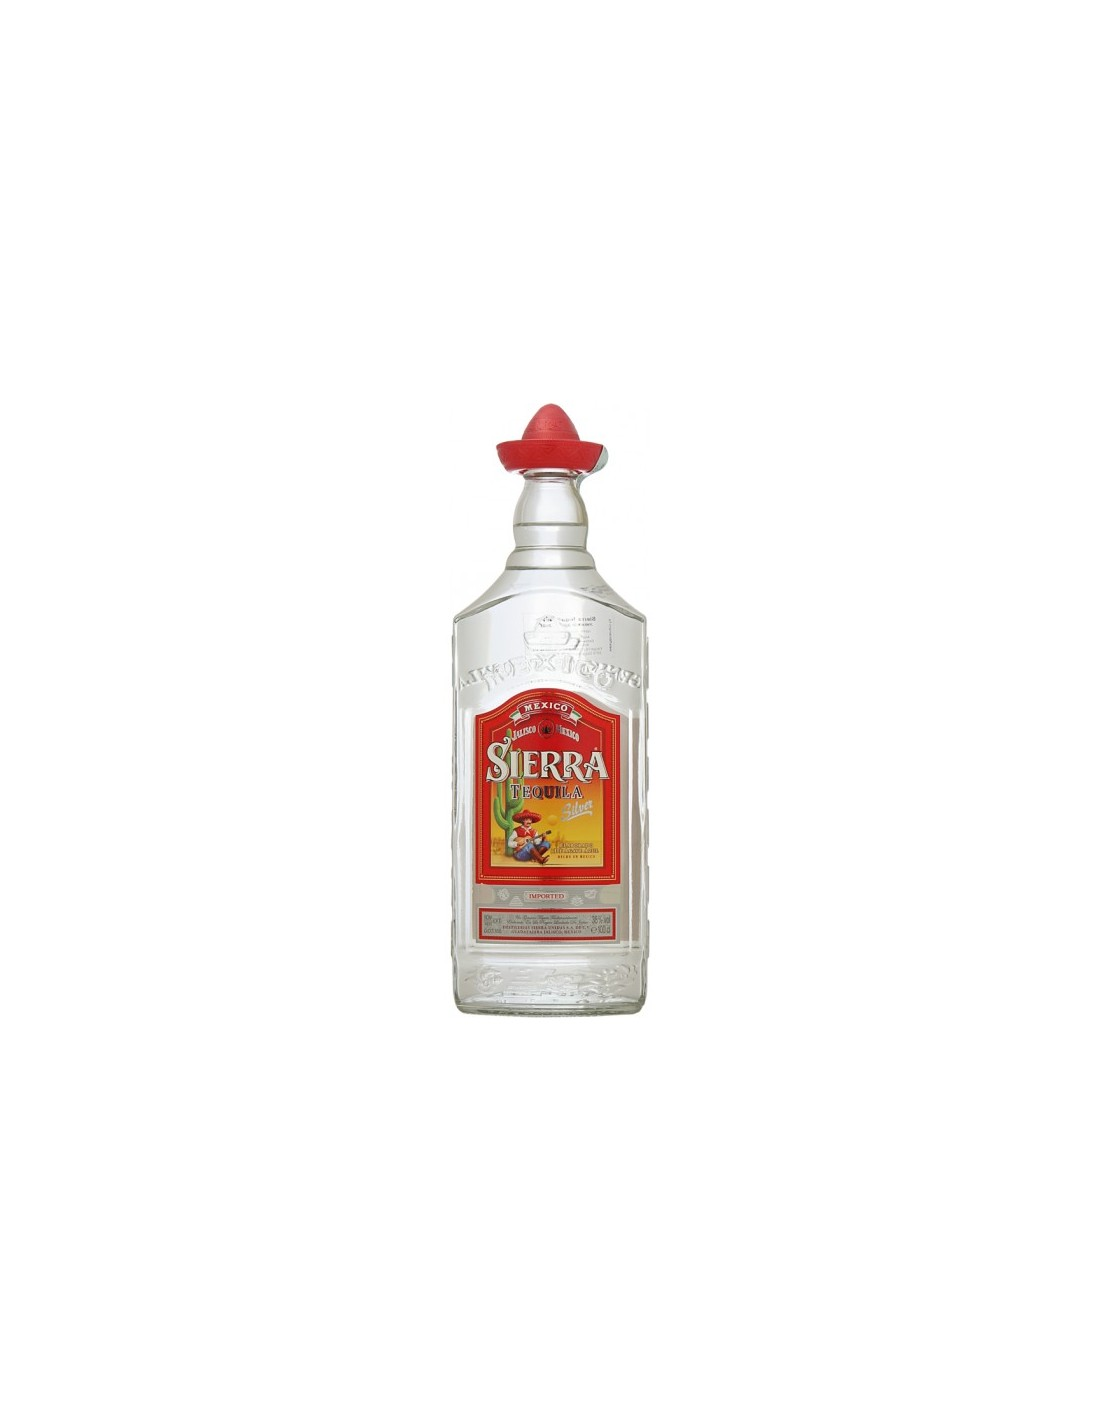 Tequila alba Sierra Silver 0.7L, 38% alc., Mexic